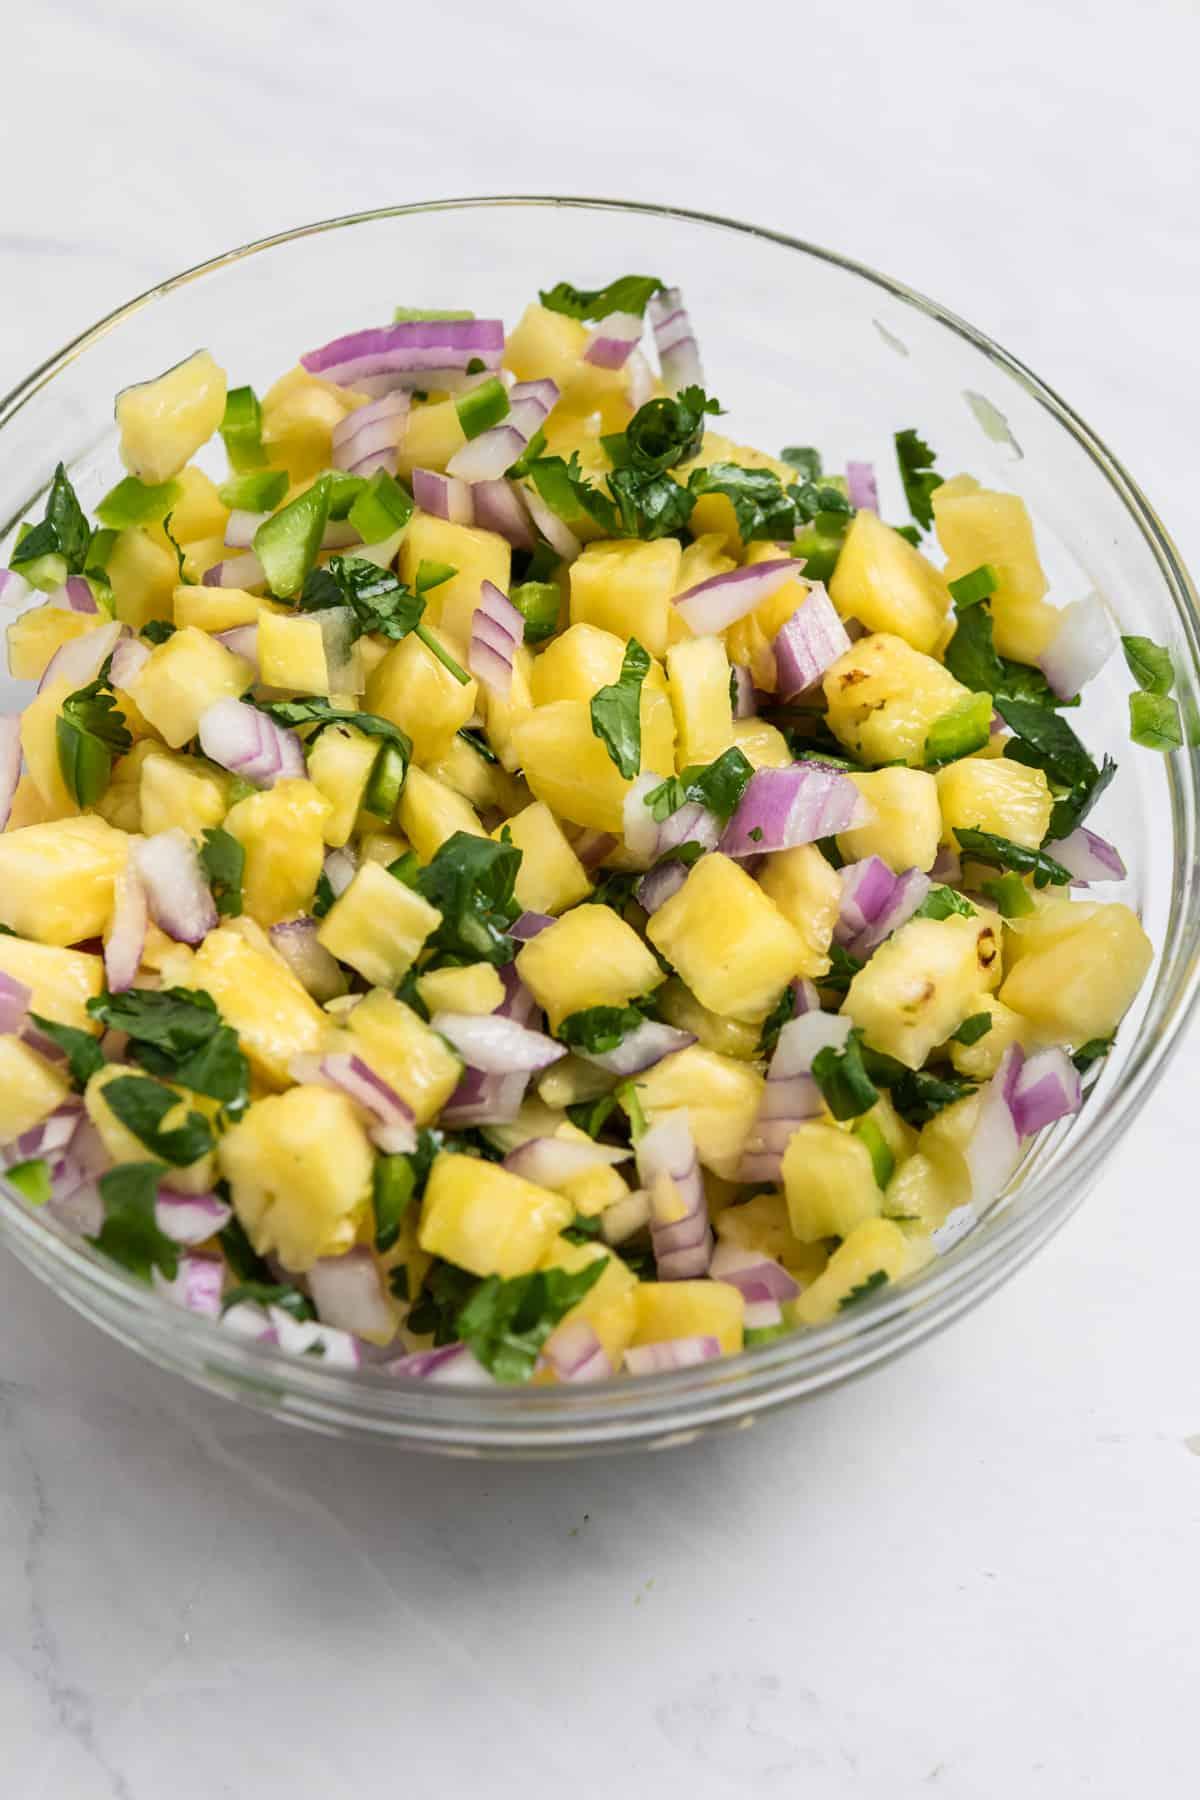 Pineapple salsa in glass bowl.